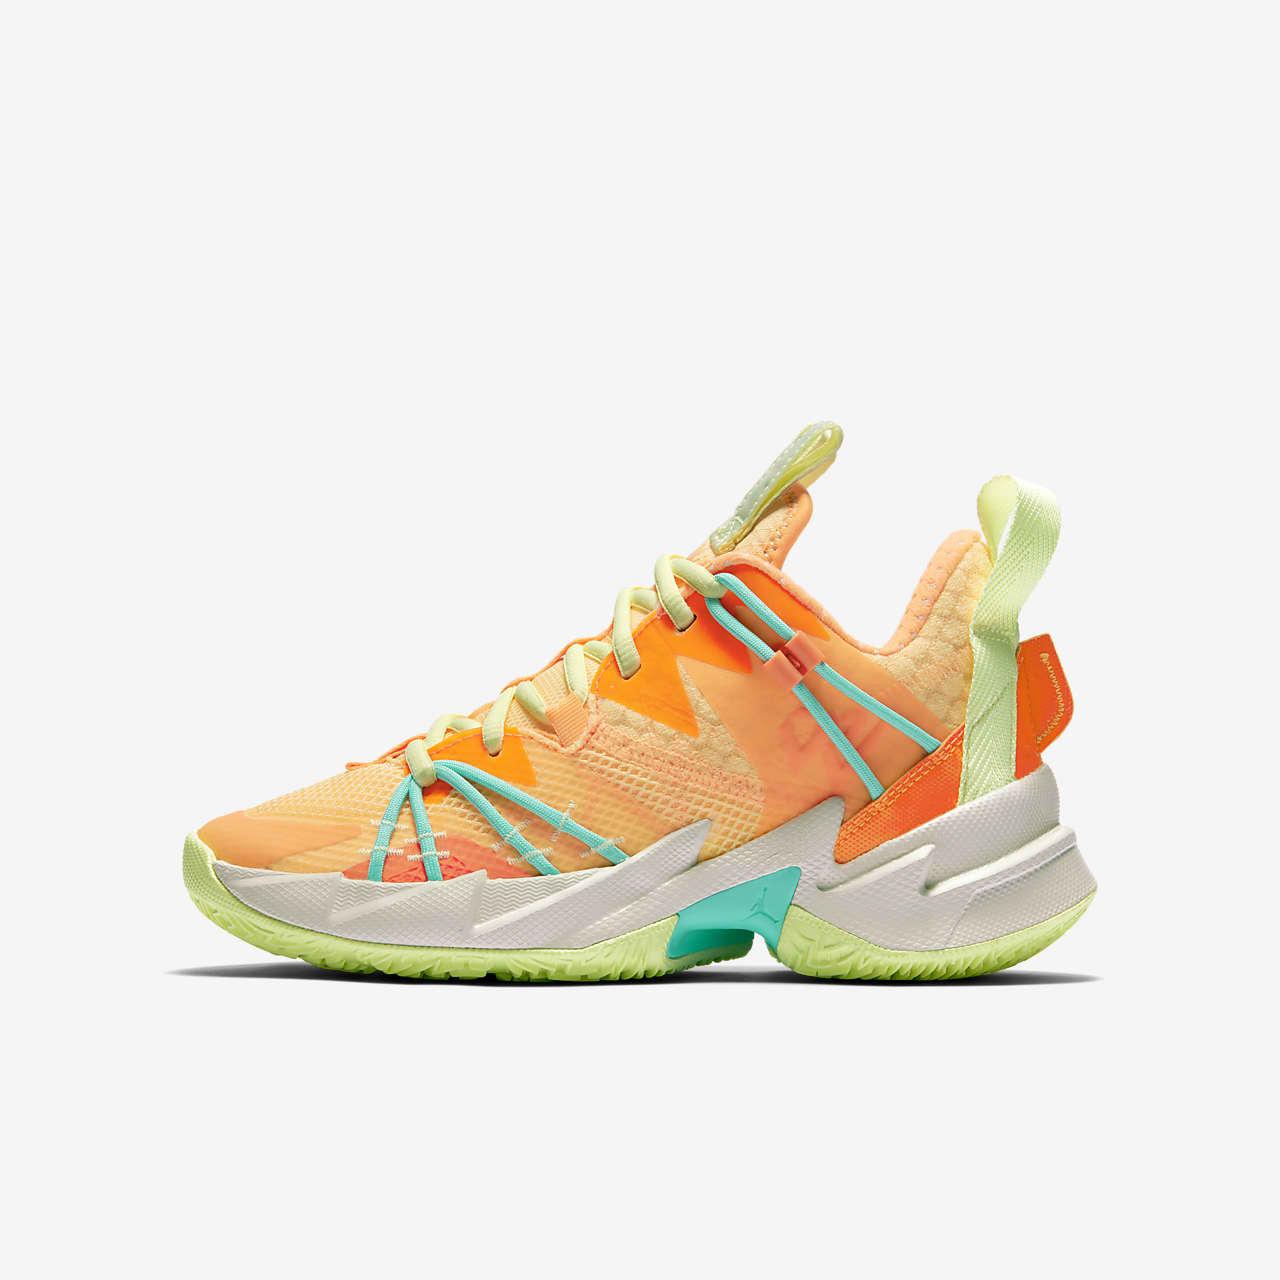 Jordan 'Why Not?' Zer0.3 SE Older Kids' Basketball Shoe